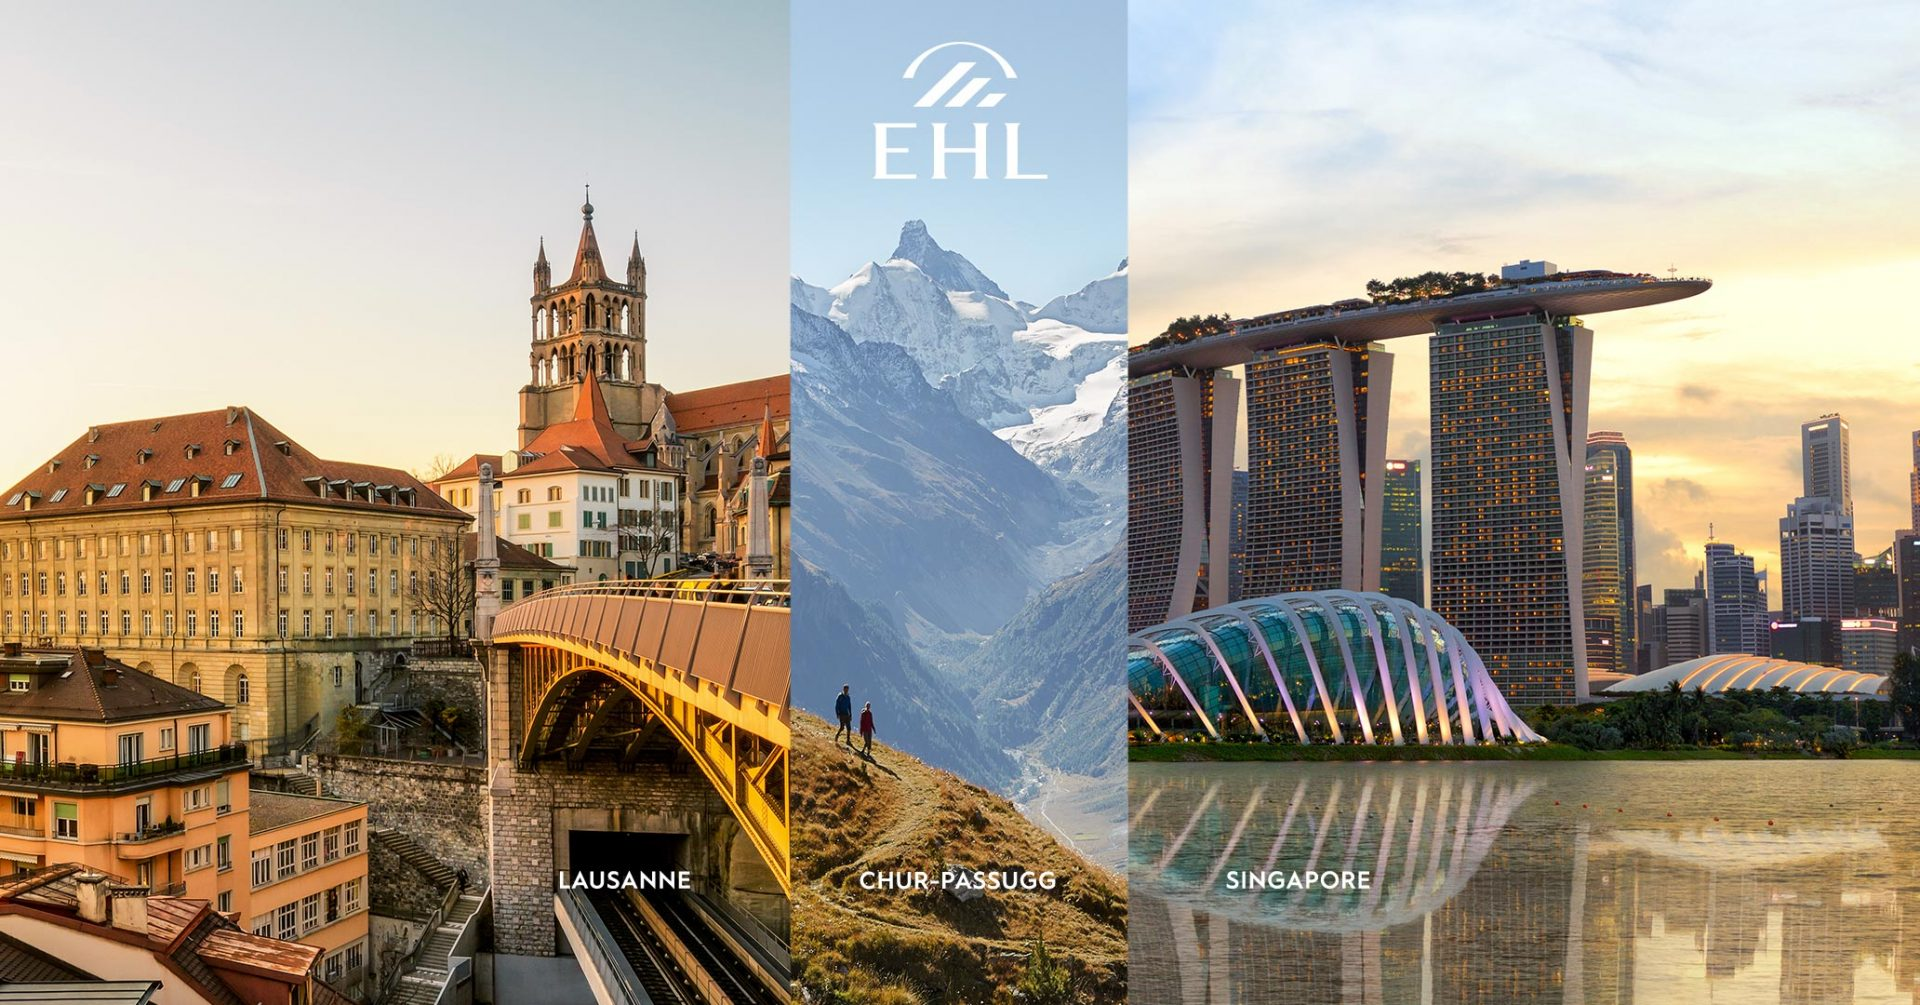 بورسیه بنیاد EHL سوئیس